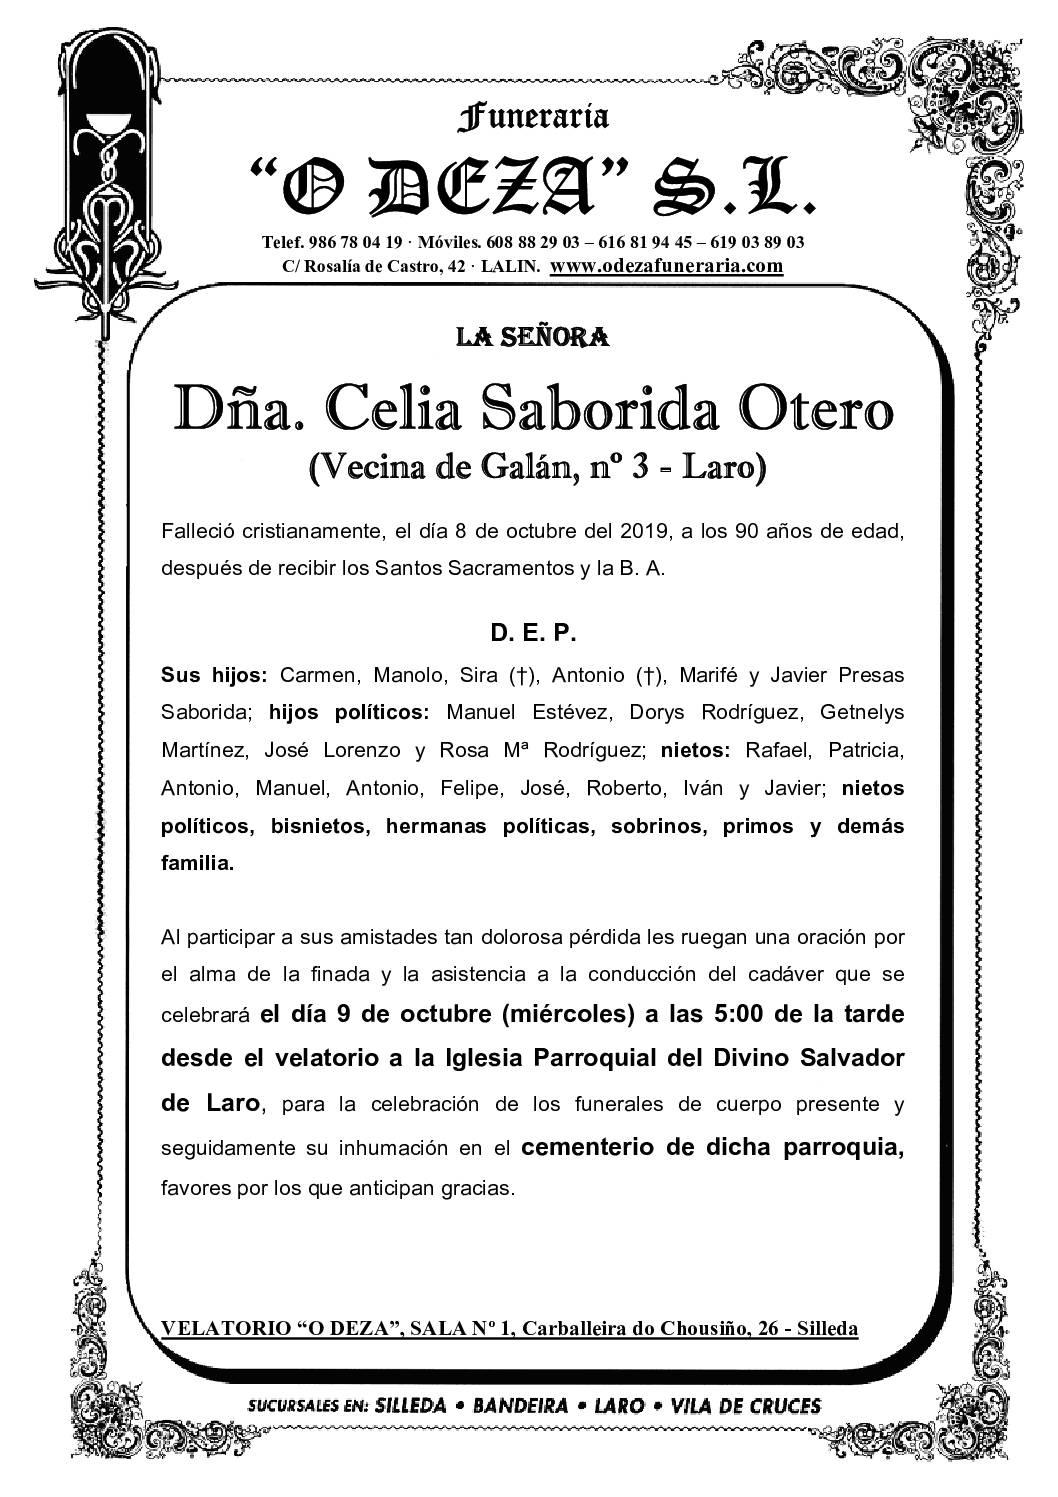 DÑA. CELIA SABORIDA OTERO